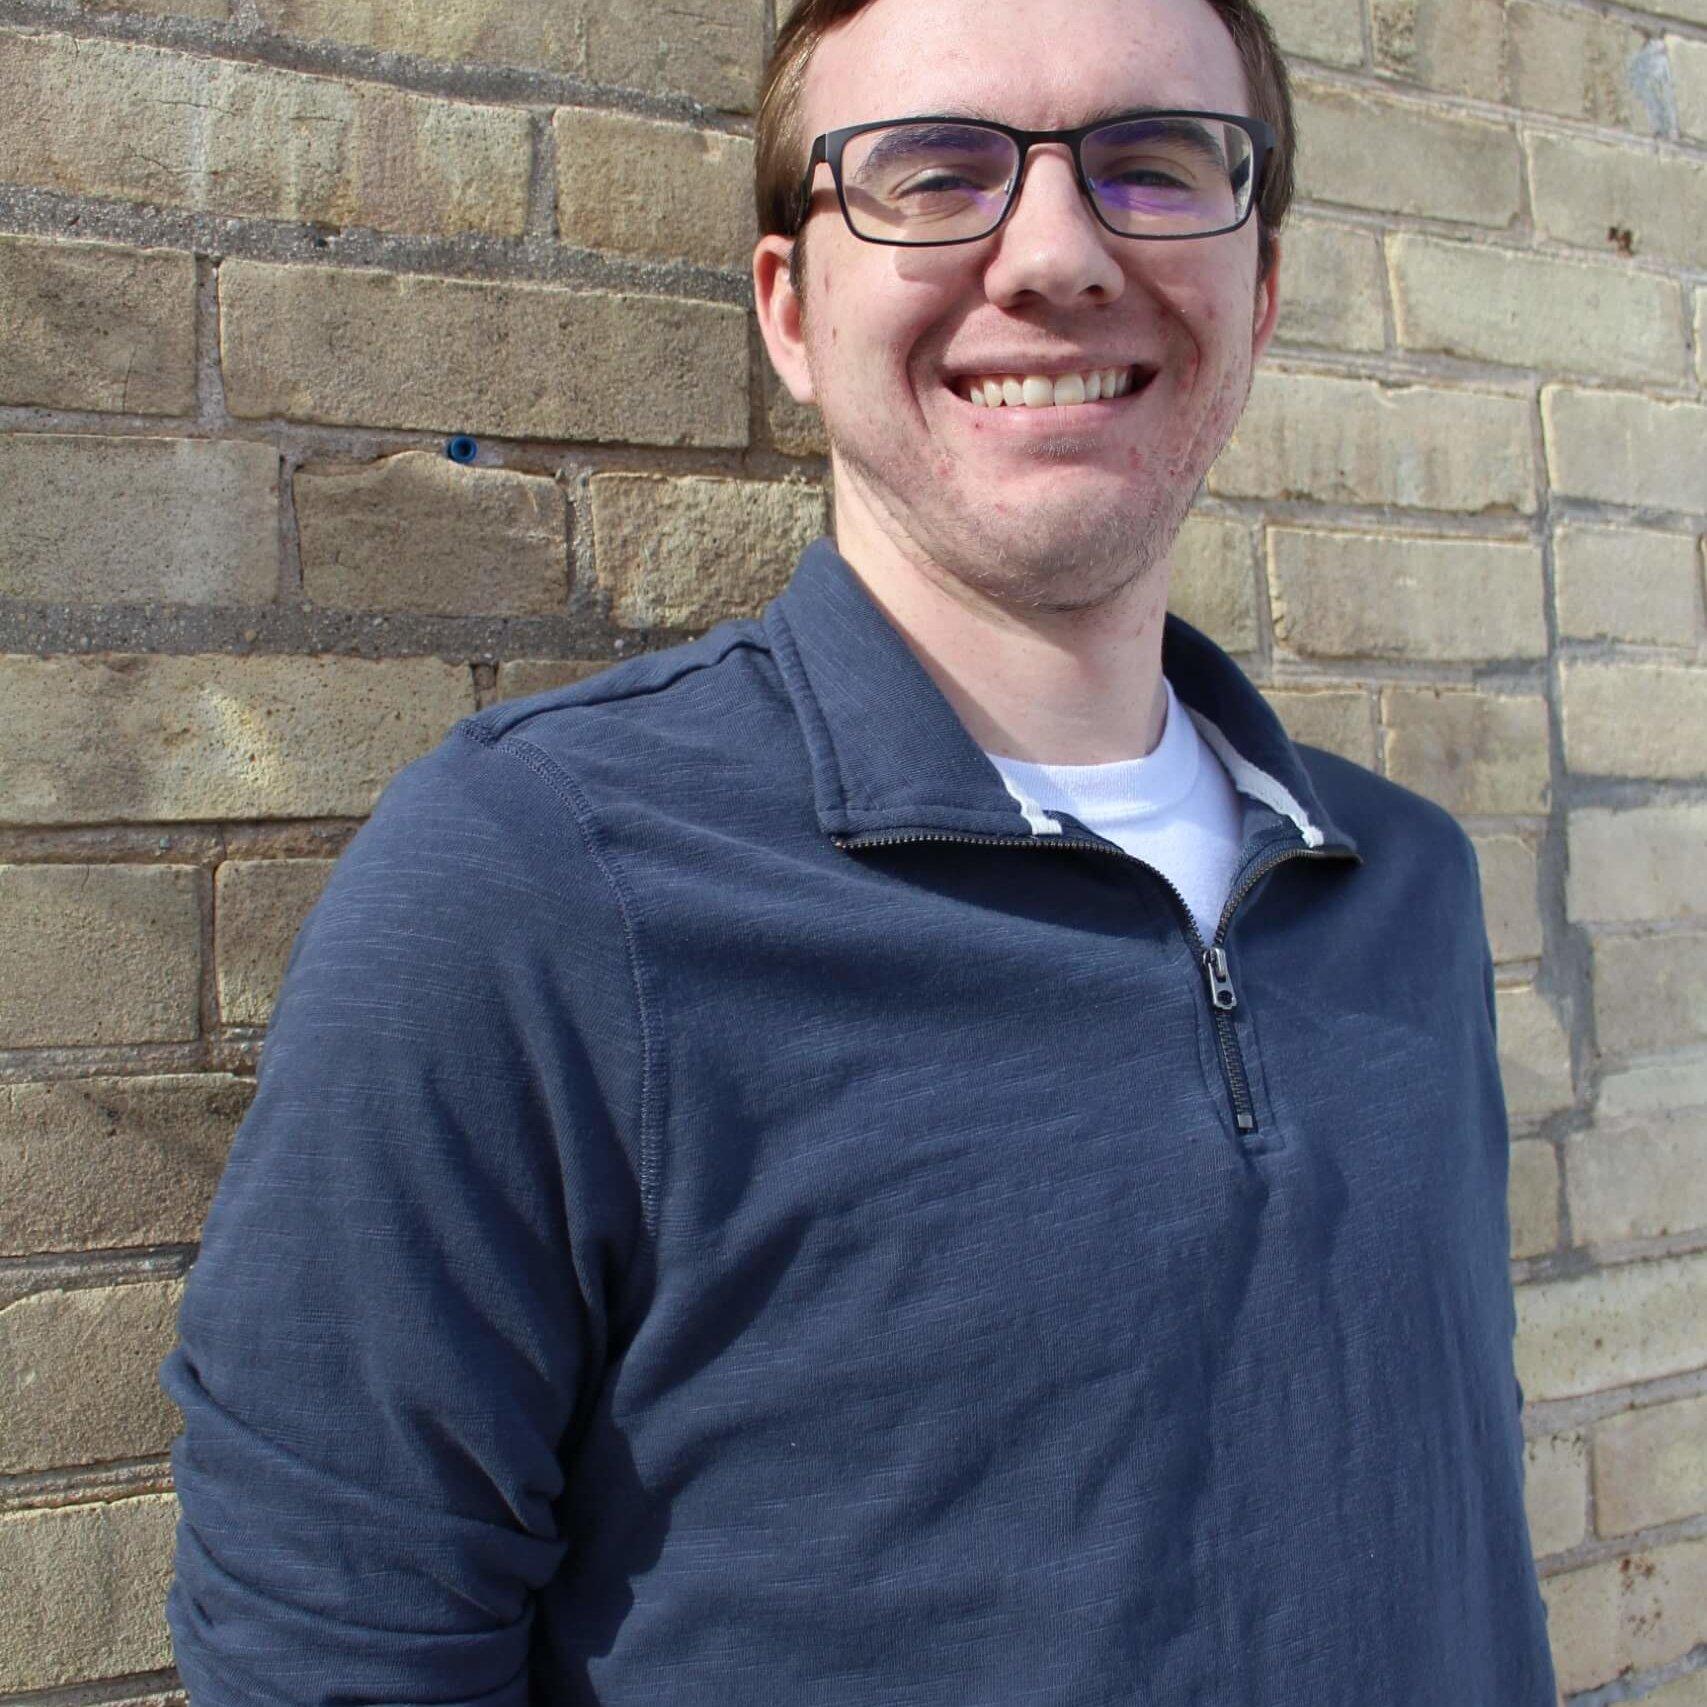 Brian Schwarze, Digital Advertising Specialist at E/Power Marketing in Oshkosh, WI